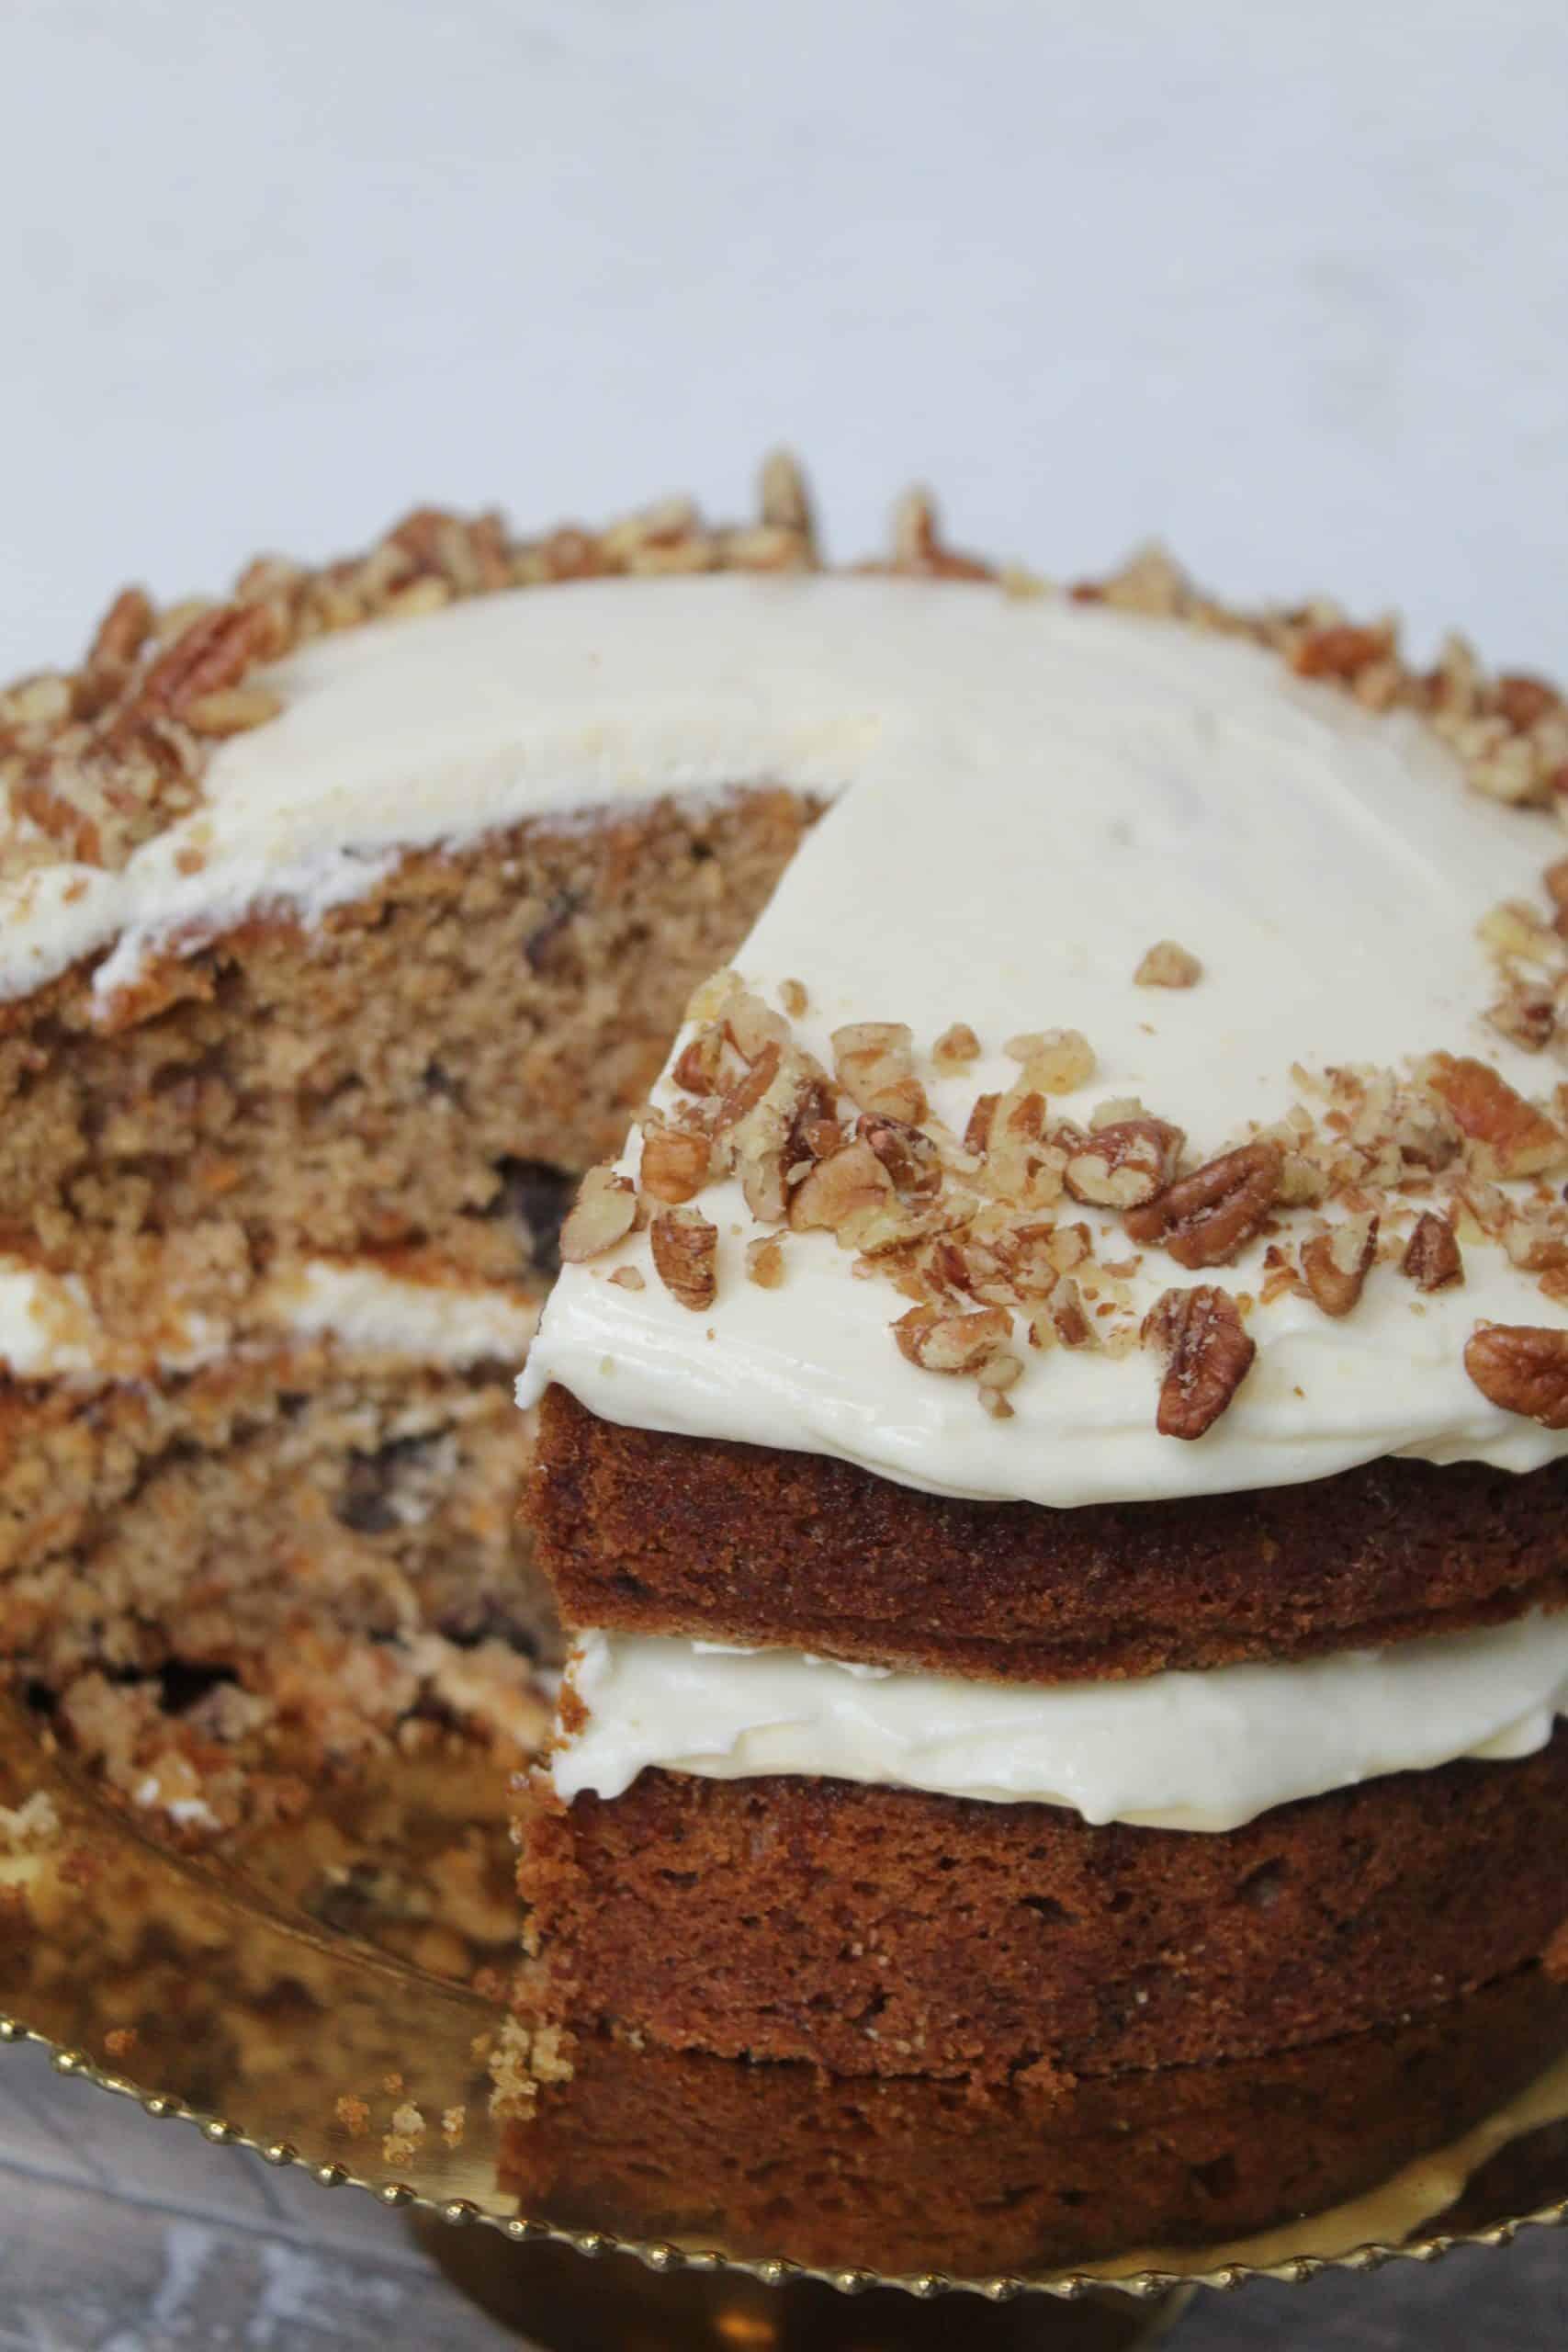 Gluten Free Carrot Cake Recipe (Dairy Free)